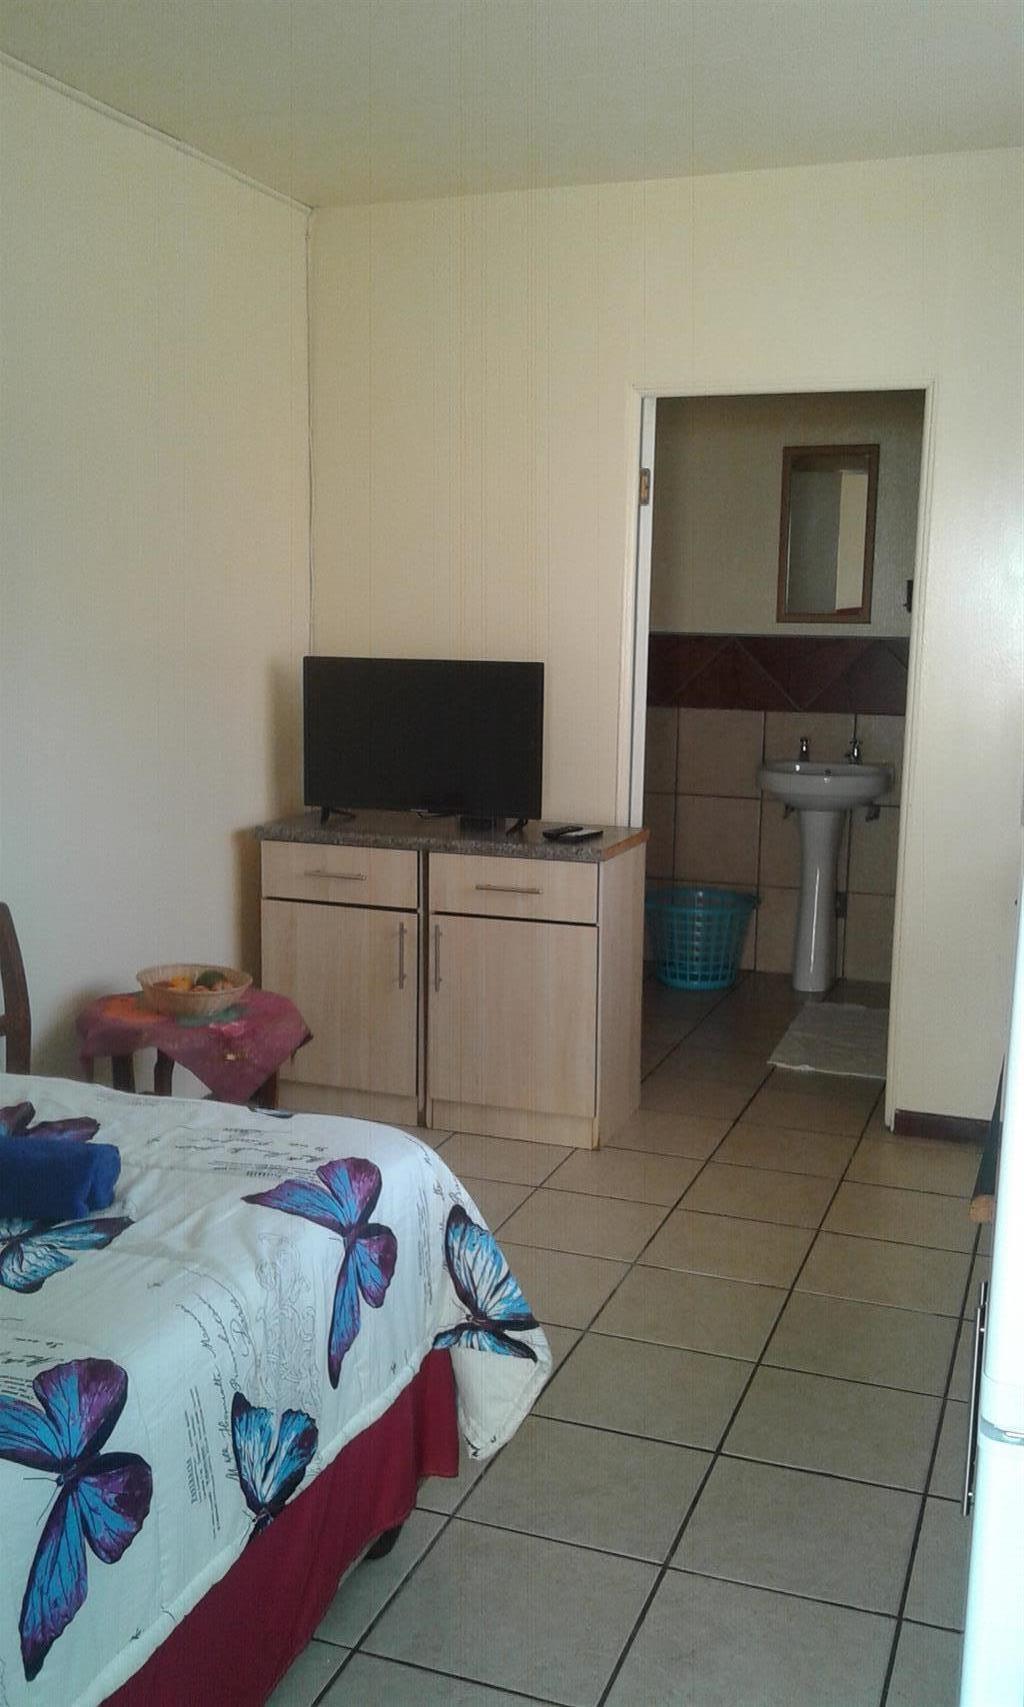 Bachelor flat to rent Carletonville